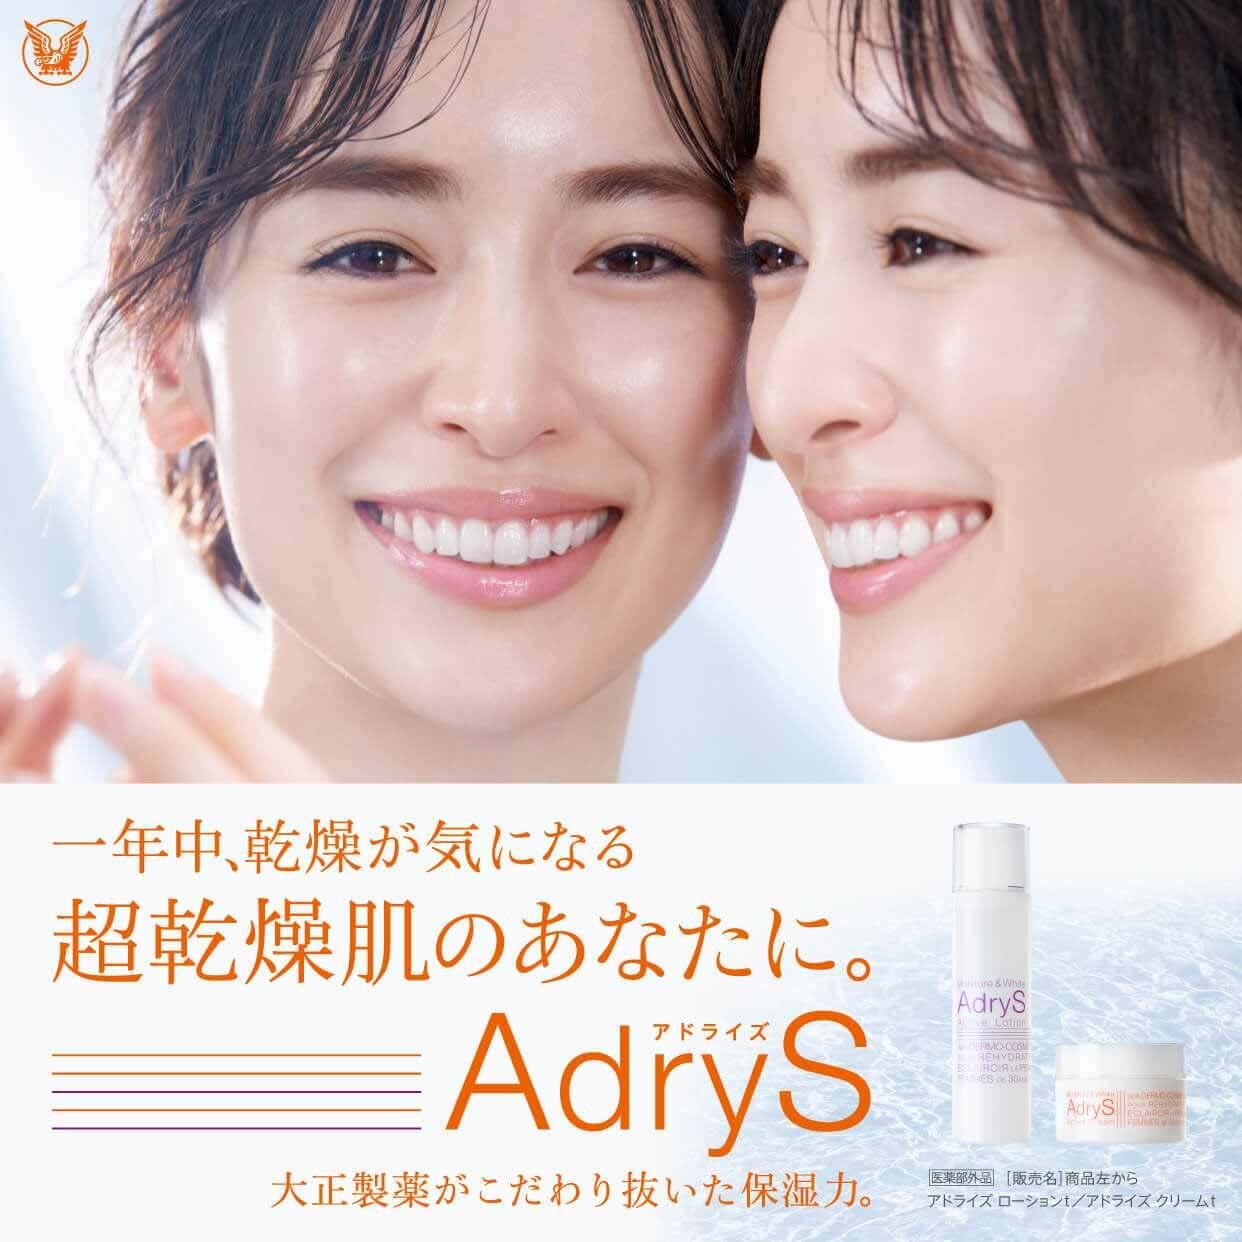 AdryS(アドライズ)大正製薬が挑む保湿美白革命。美白:メラニンの生成を抑え、日焼けによるシミ・そばかすを防ぐ 【医薬部外品】[販売名]商品左から アドライズ ローションt/アドライズ クリームt